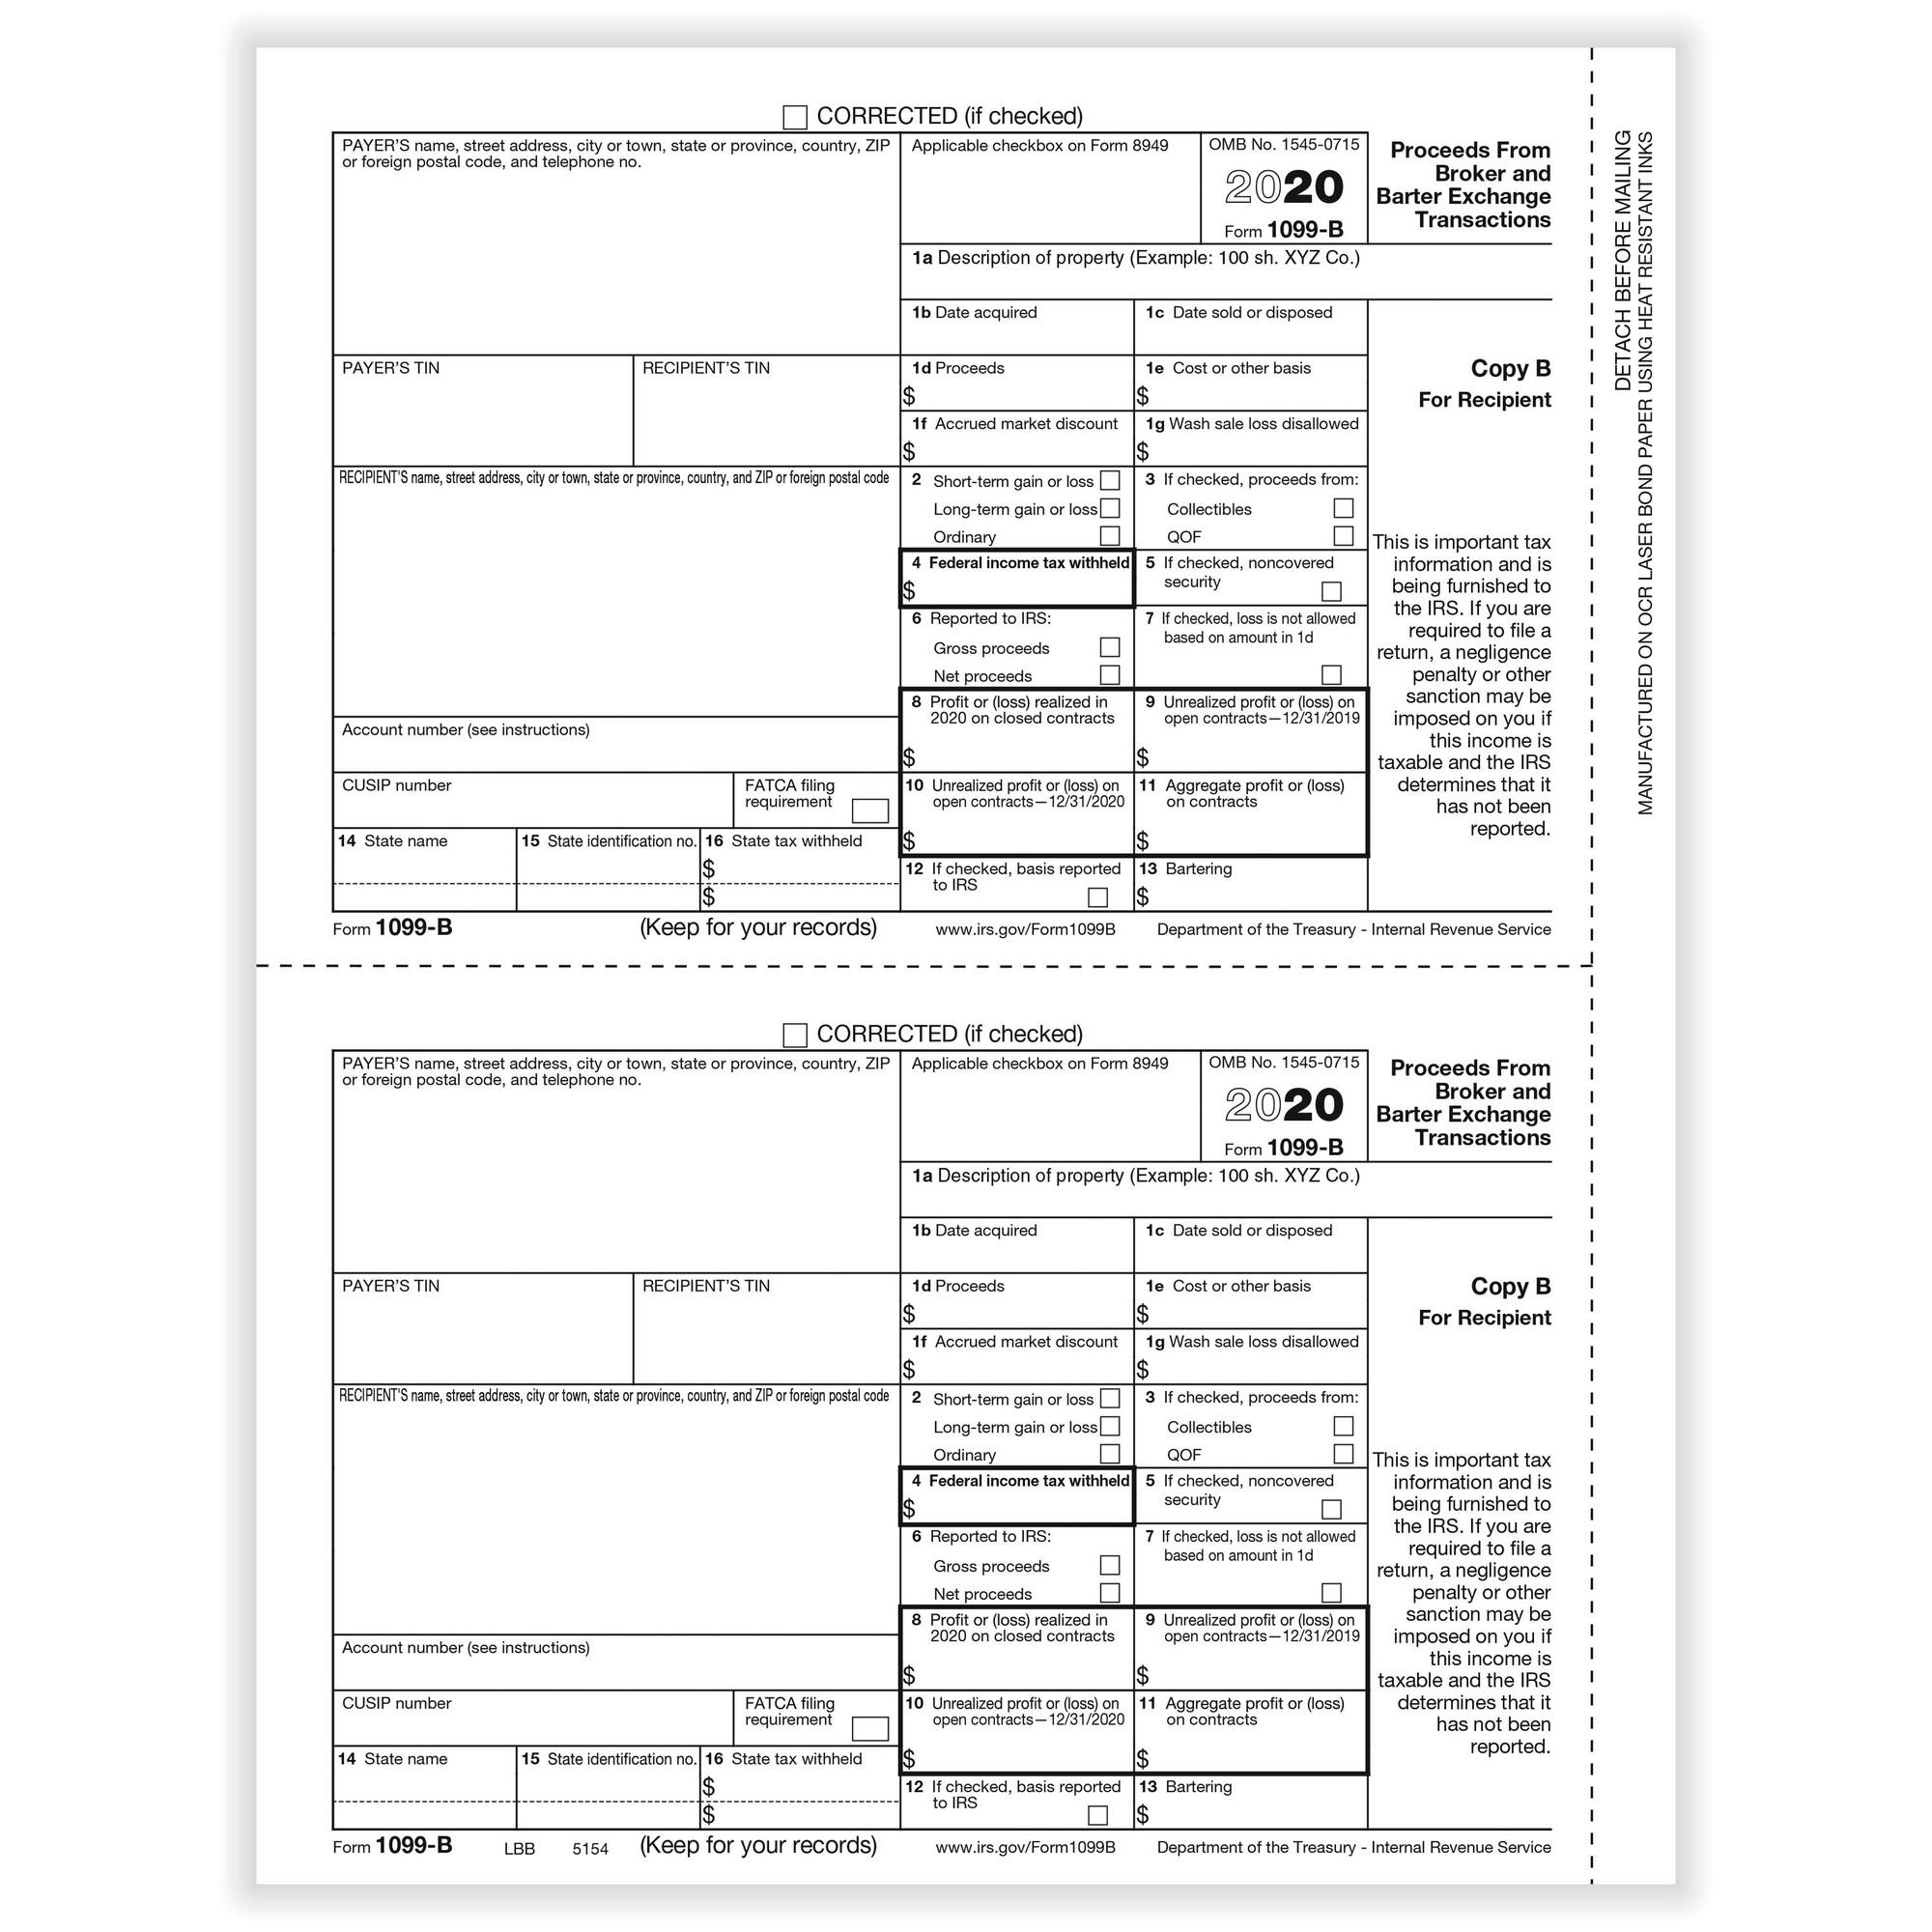 B Broker Rec Copy B Cut Sheet 400 Forms Pack